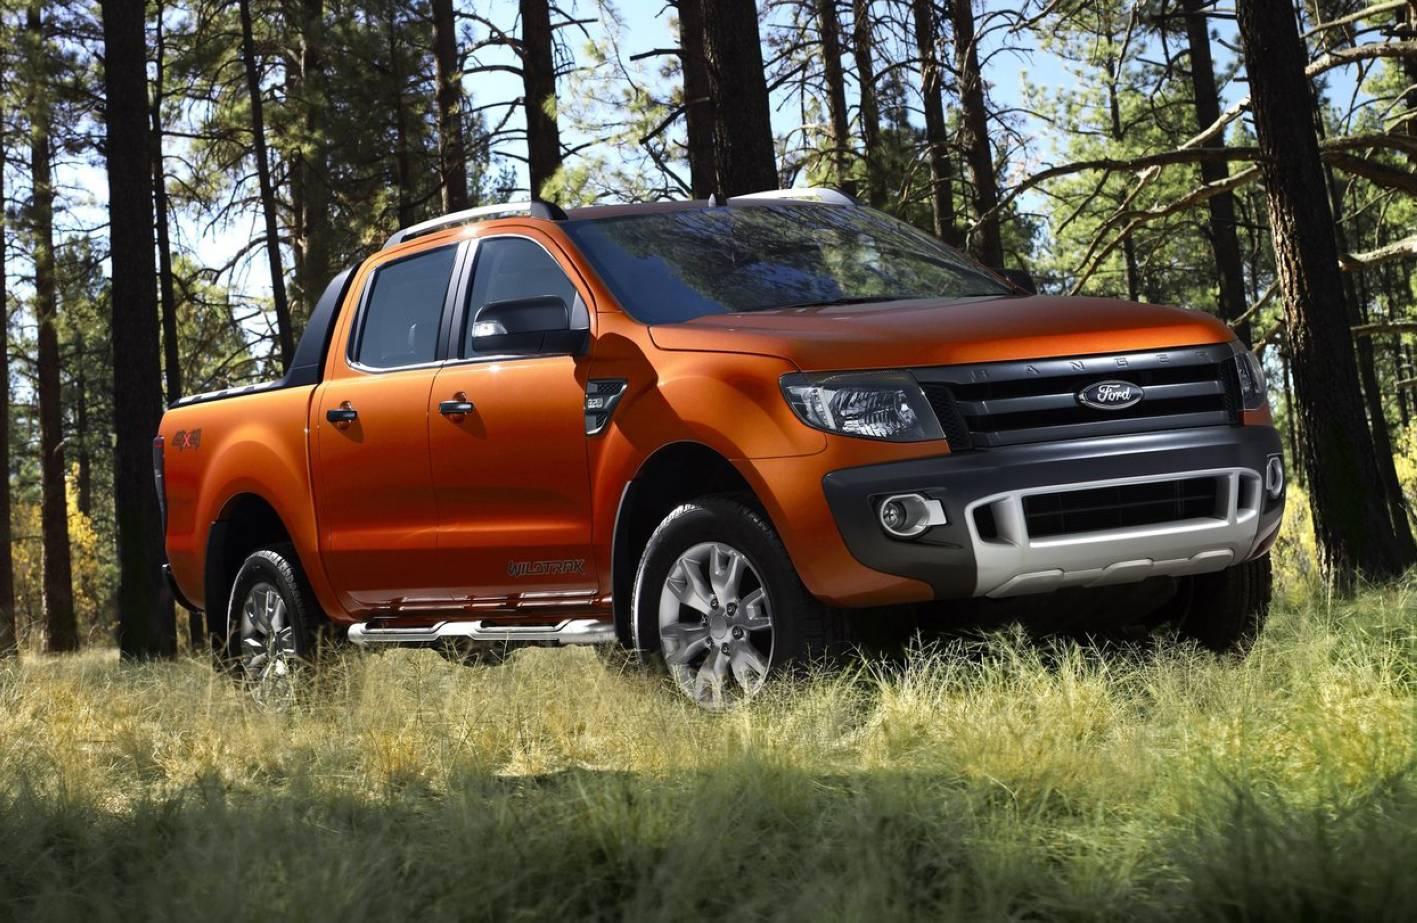 2012 ford ranger wildtrack now on sale in australia performancedrive. Black Bedroom Furniture Sets. Home Design Ideas